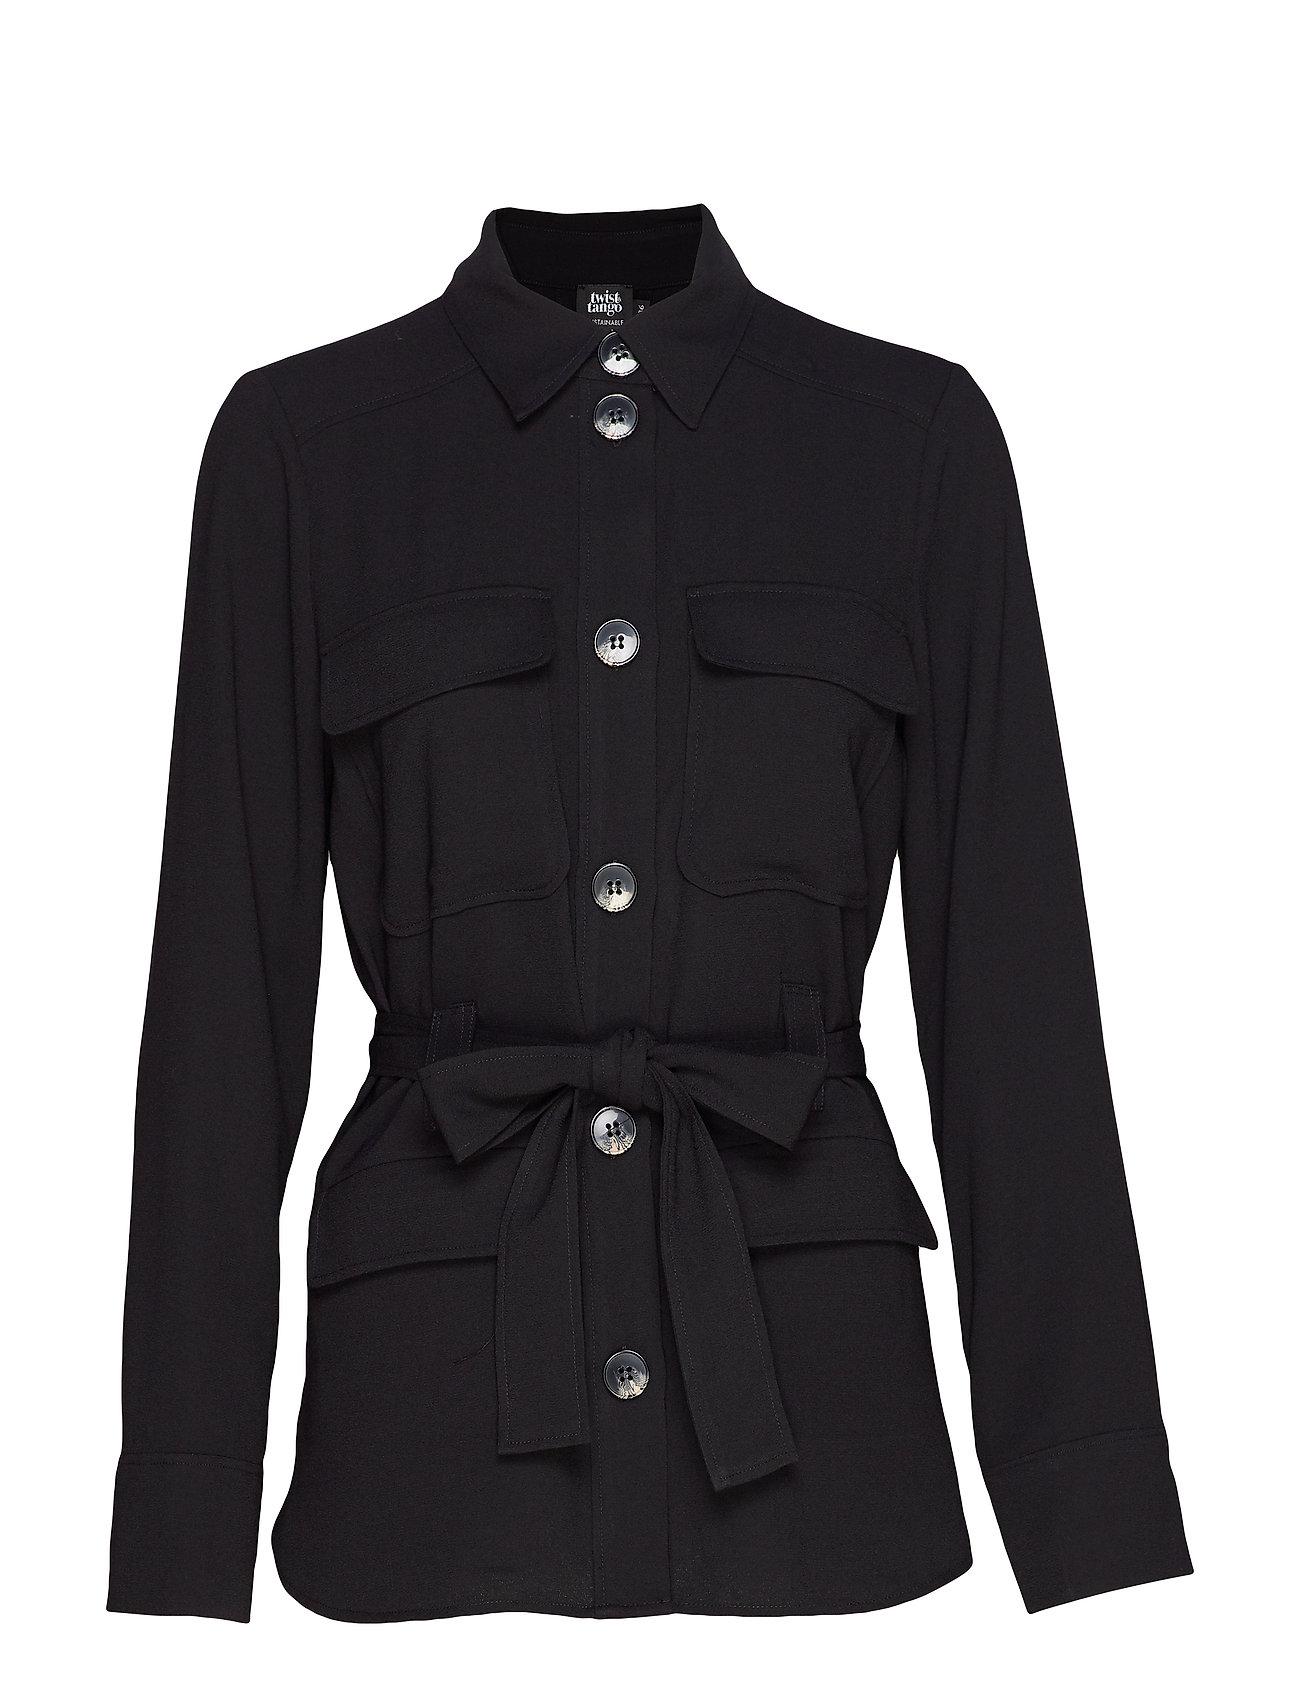 Nike Jacket Black Twist & Tango